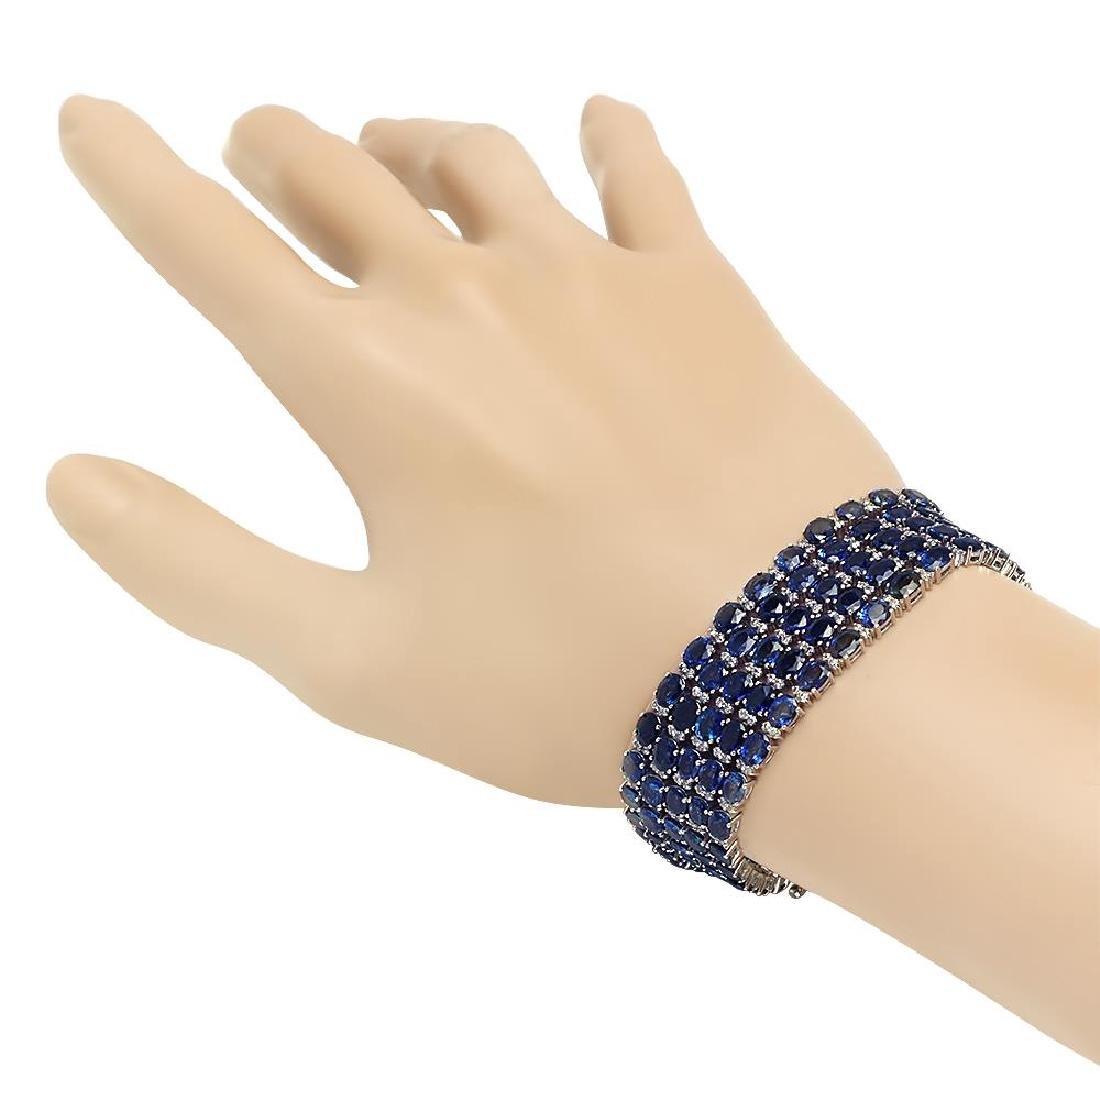 18K Gold 48.44ct Sapphire 4.02ct Diamond Bracelet - 2